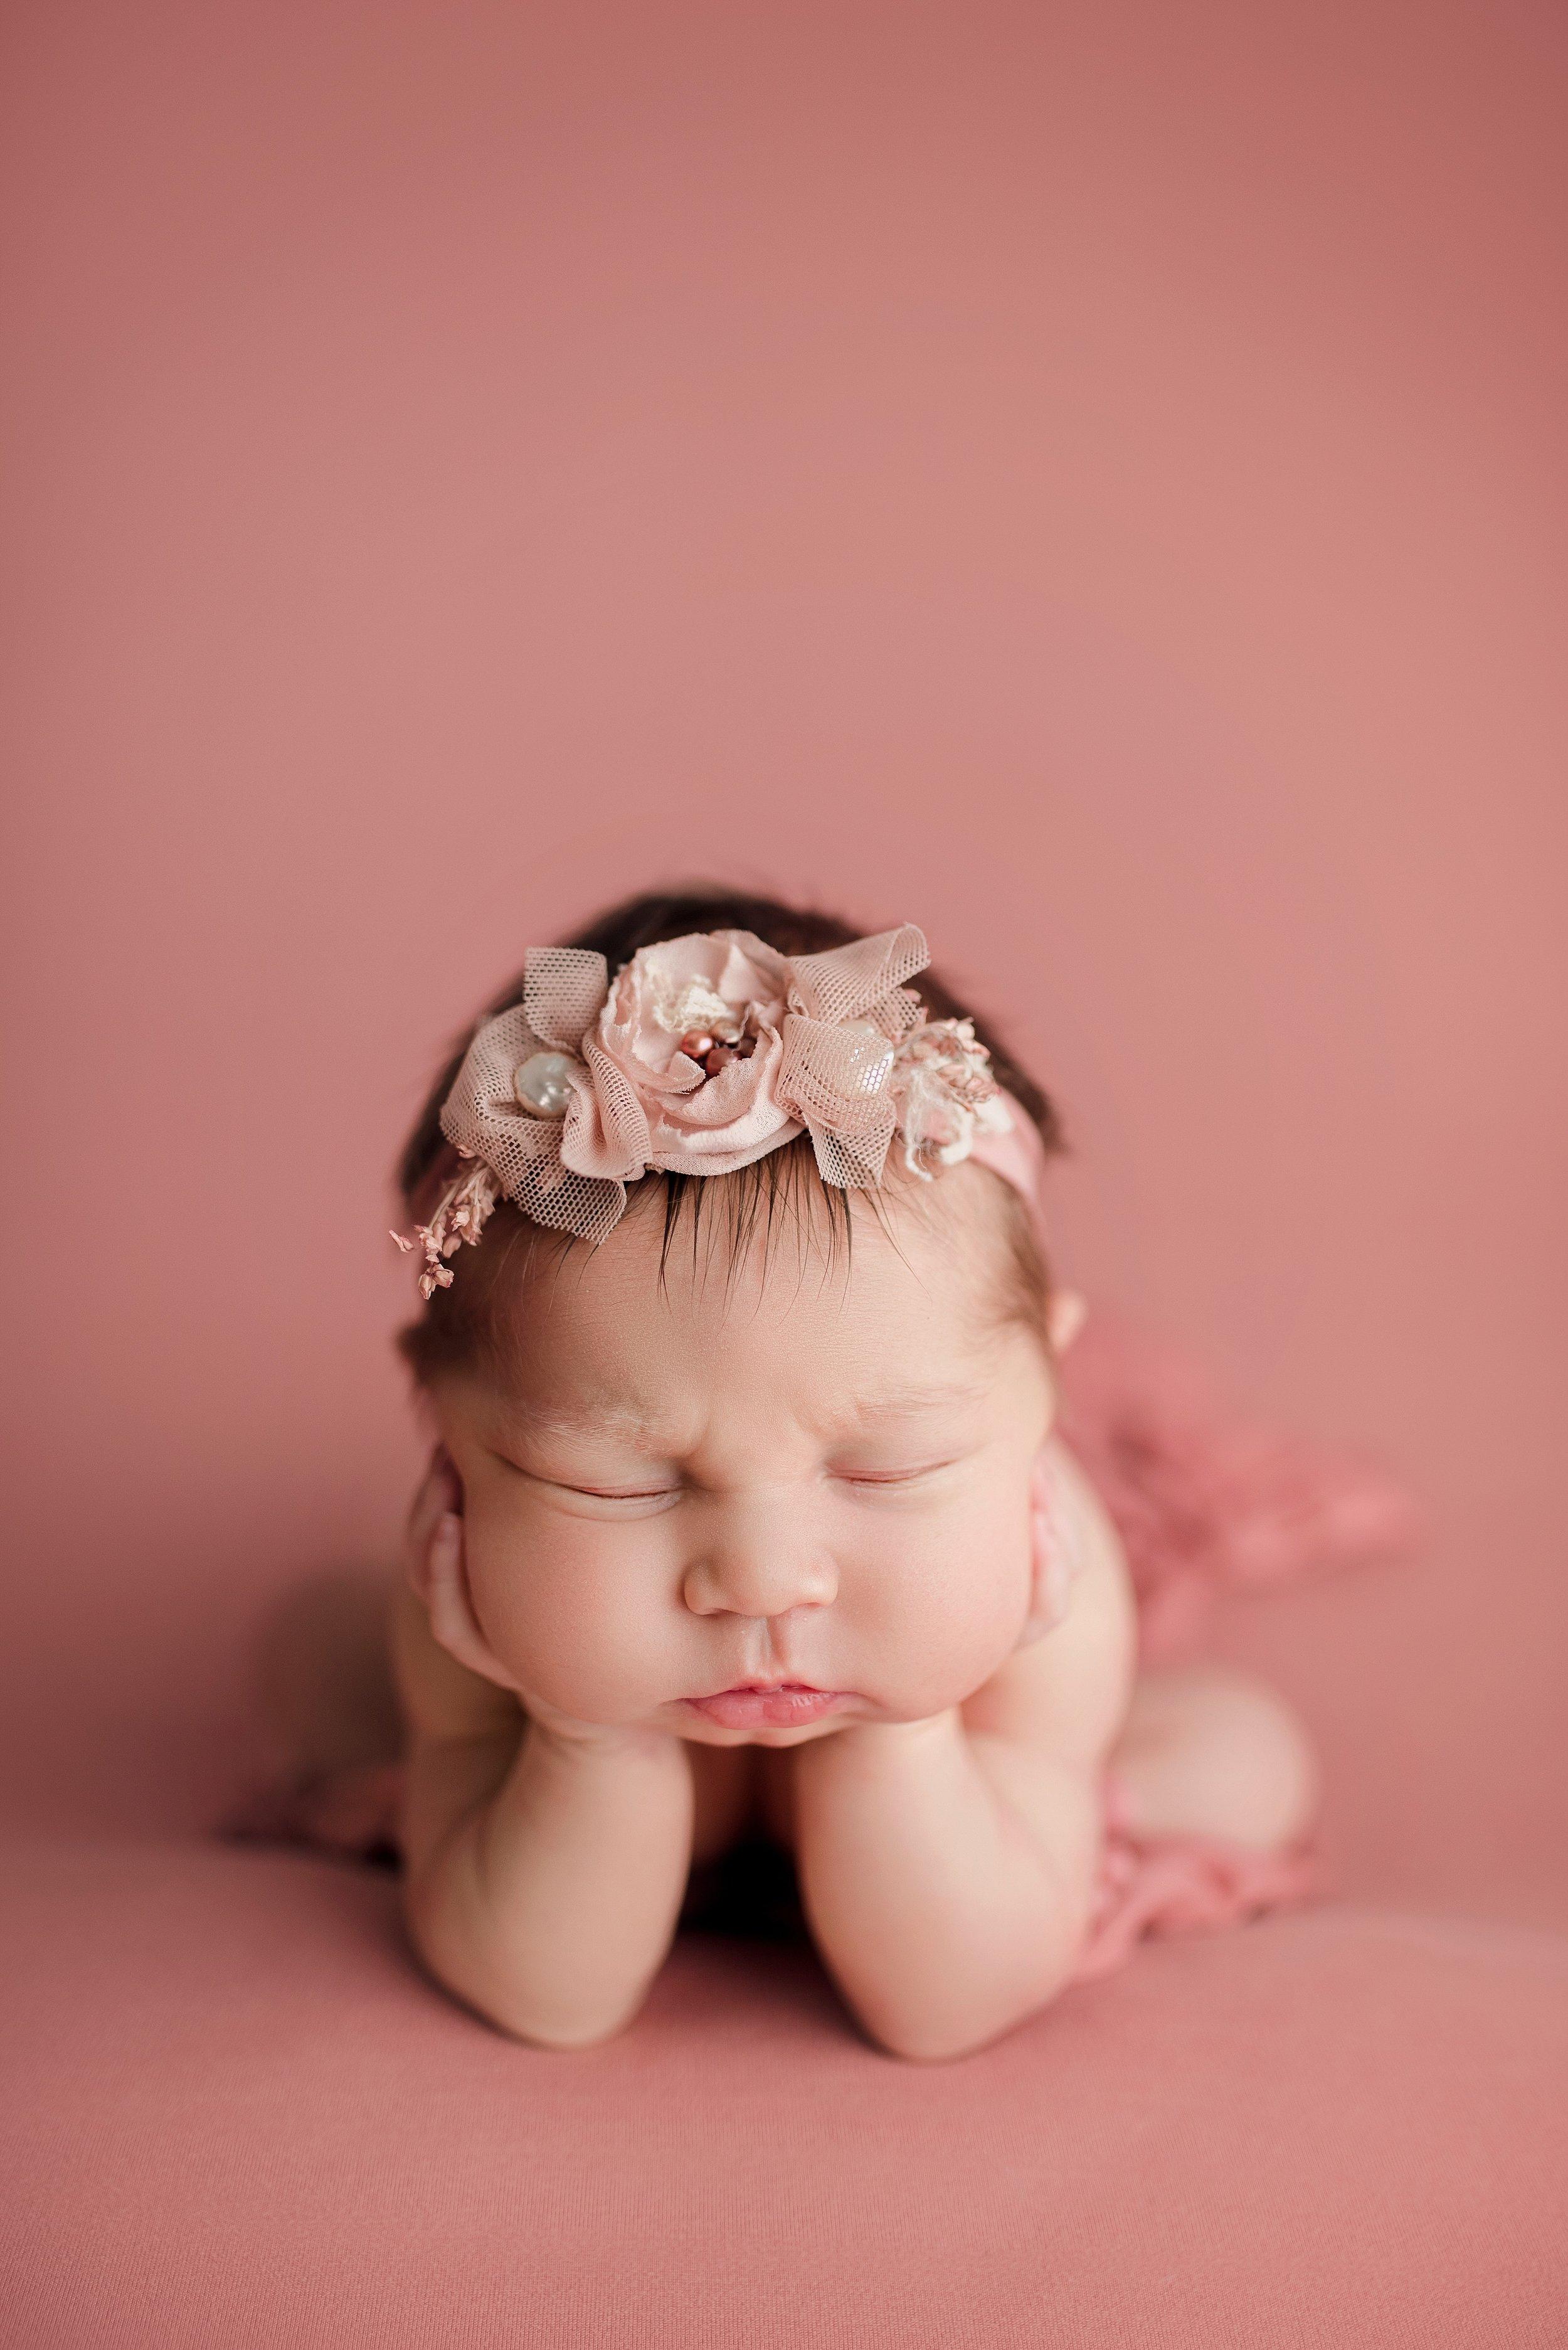 Newborn babygirl froggy posing